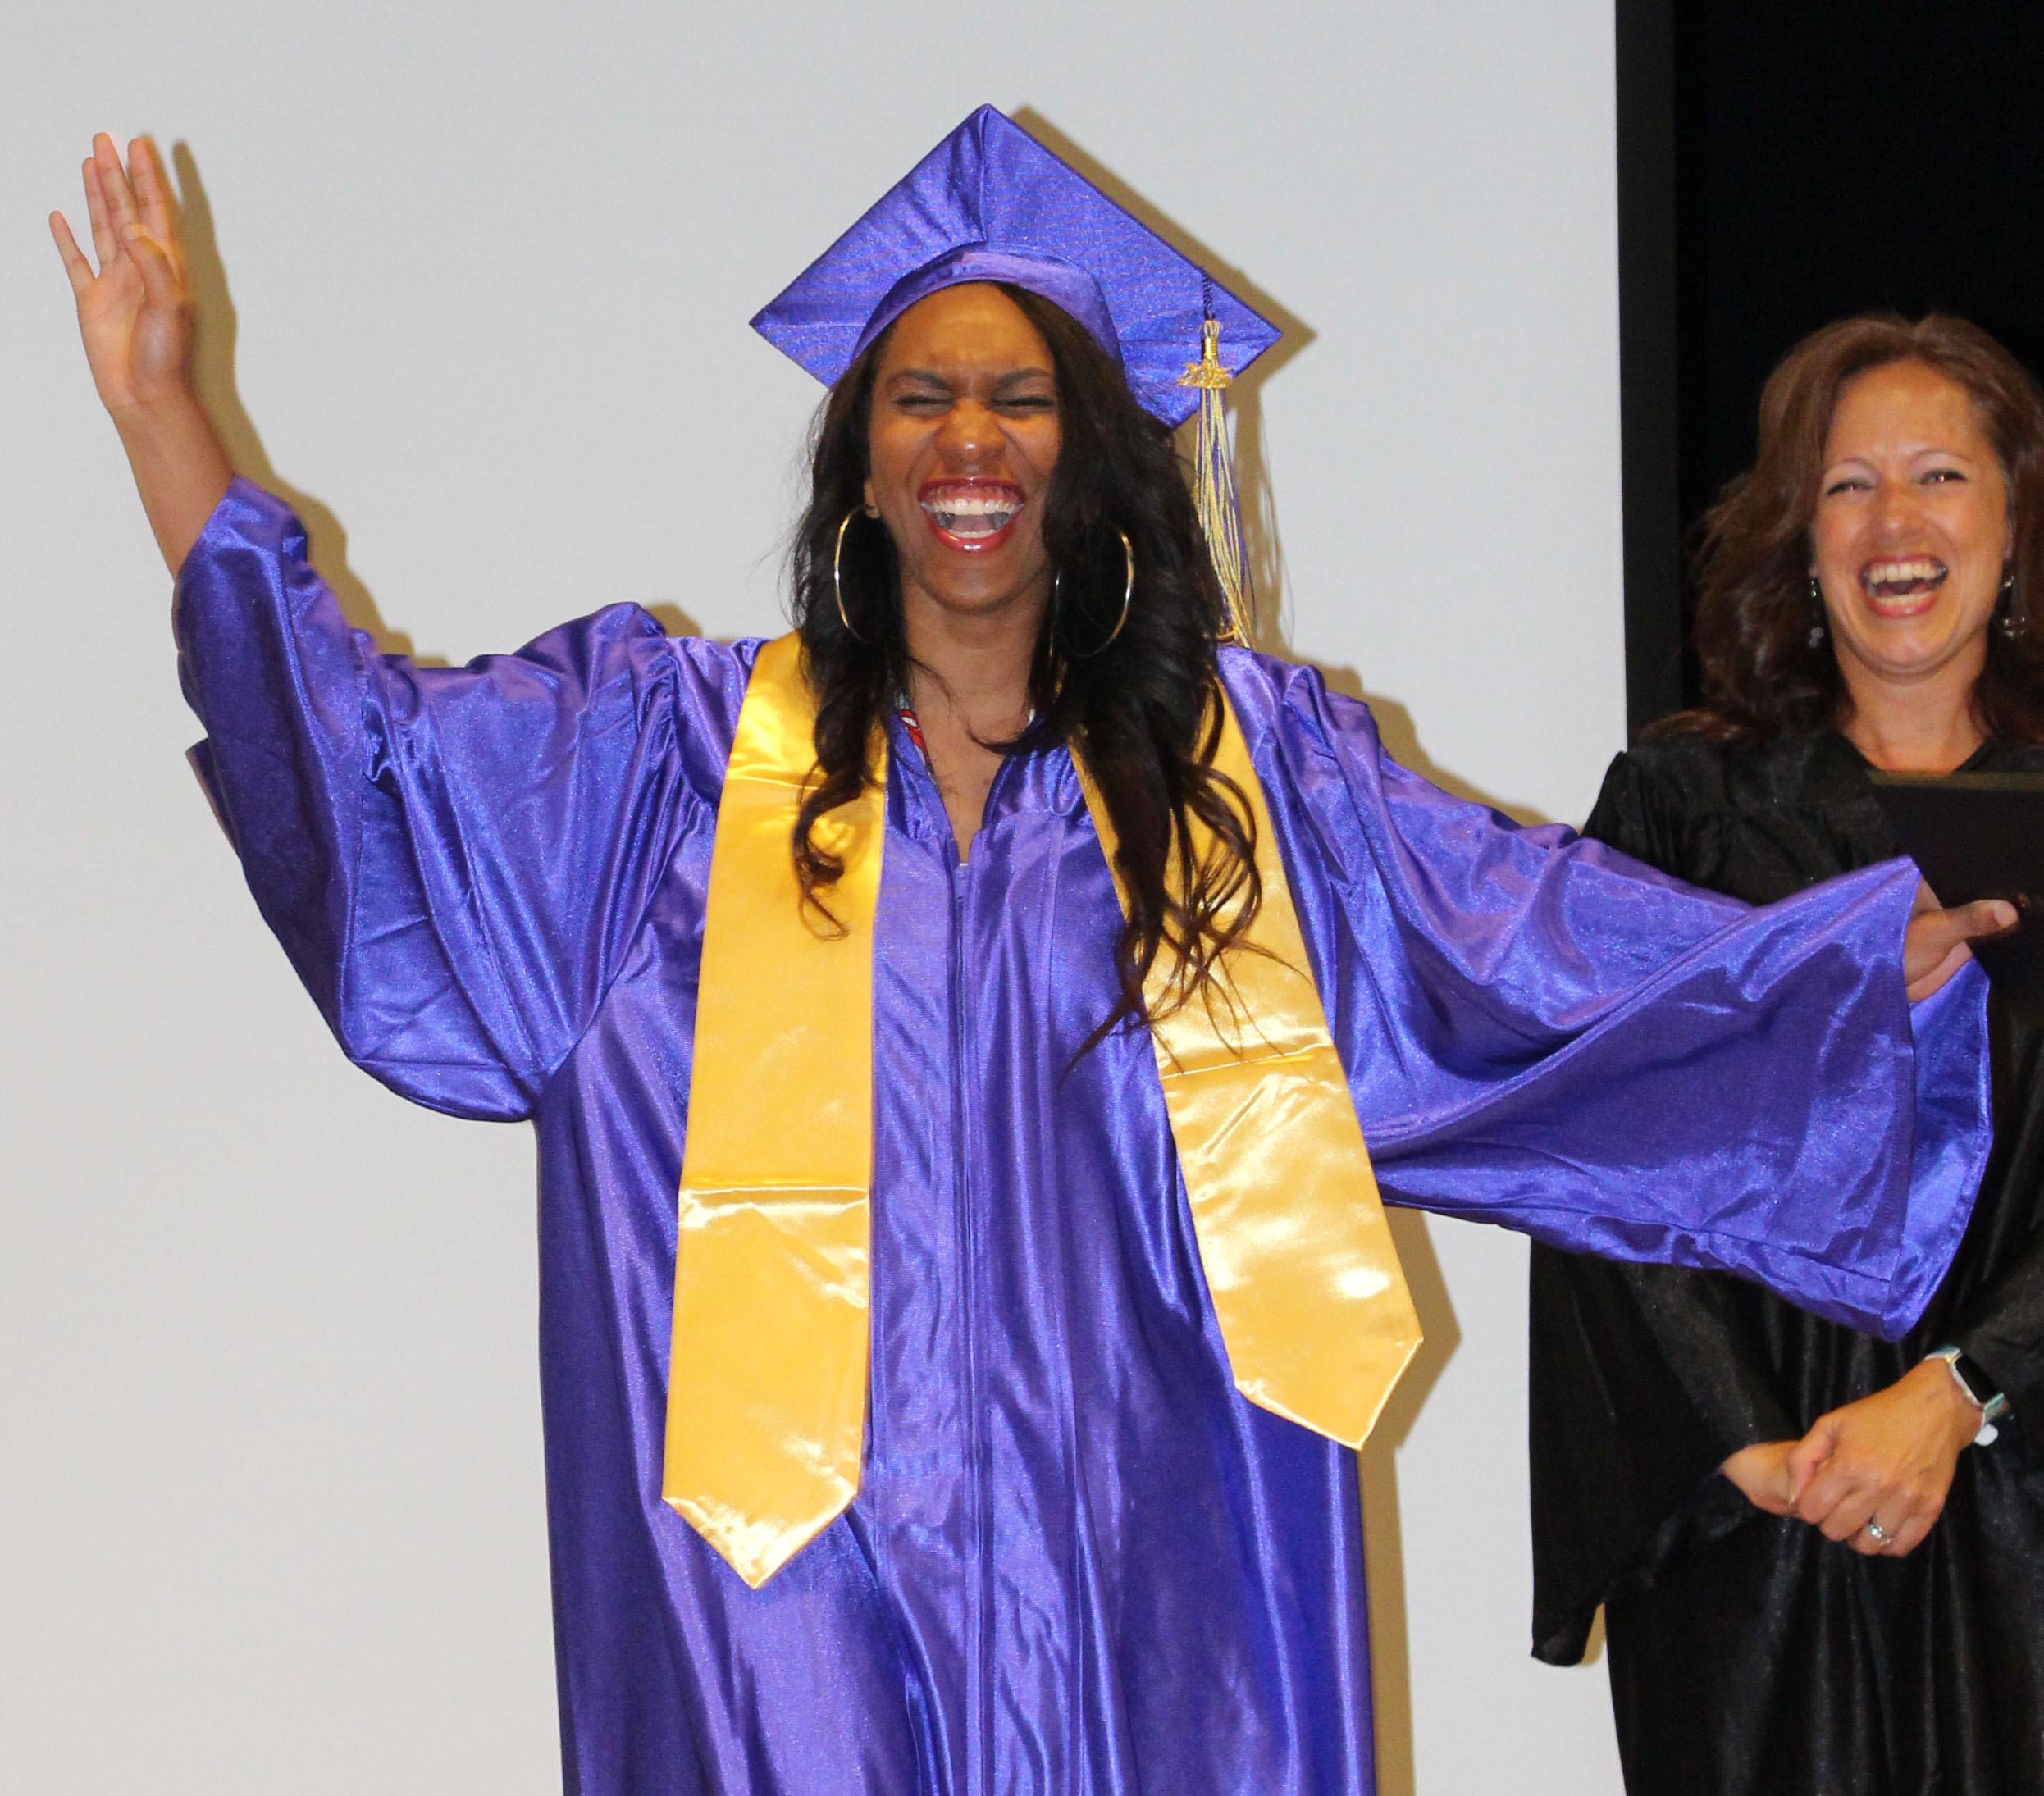 SIATech Perris Graduation